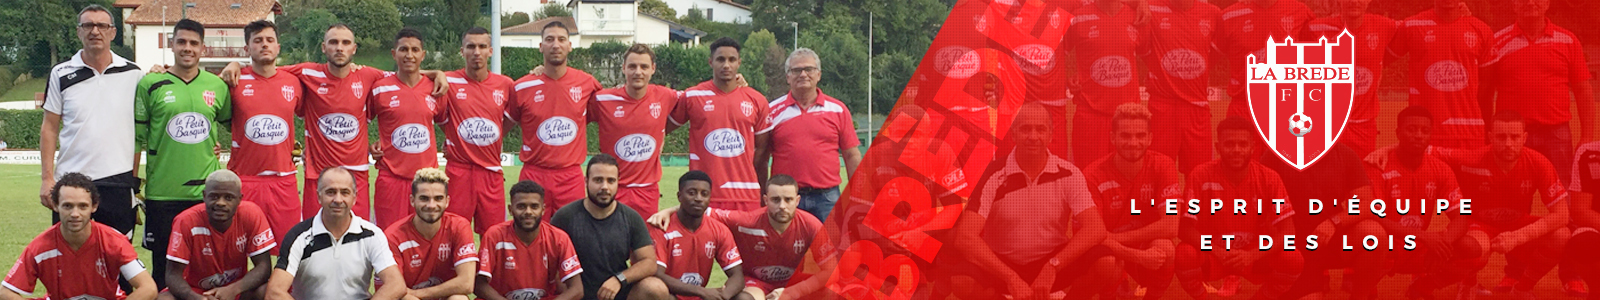 LA BREDE FOOTBALL CLUB : site officiel du club de foot de La Brède - footeo